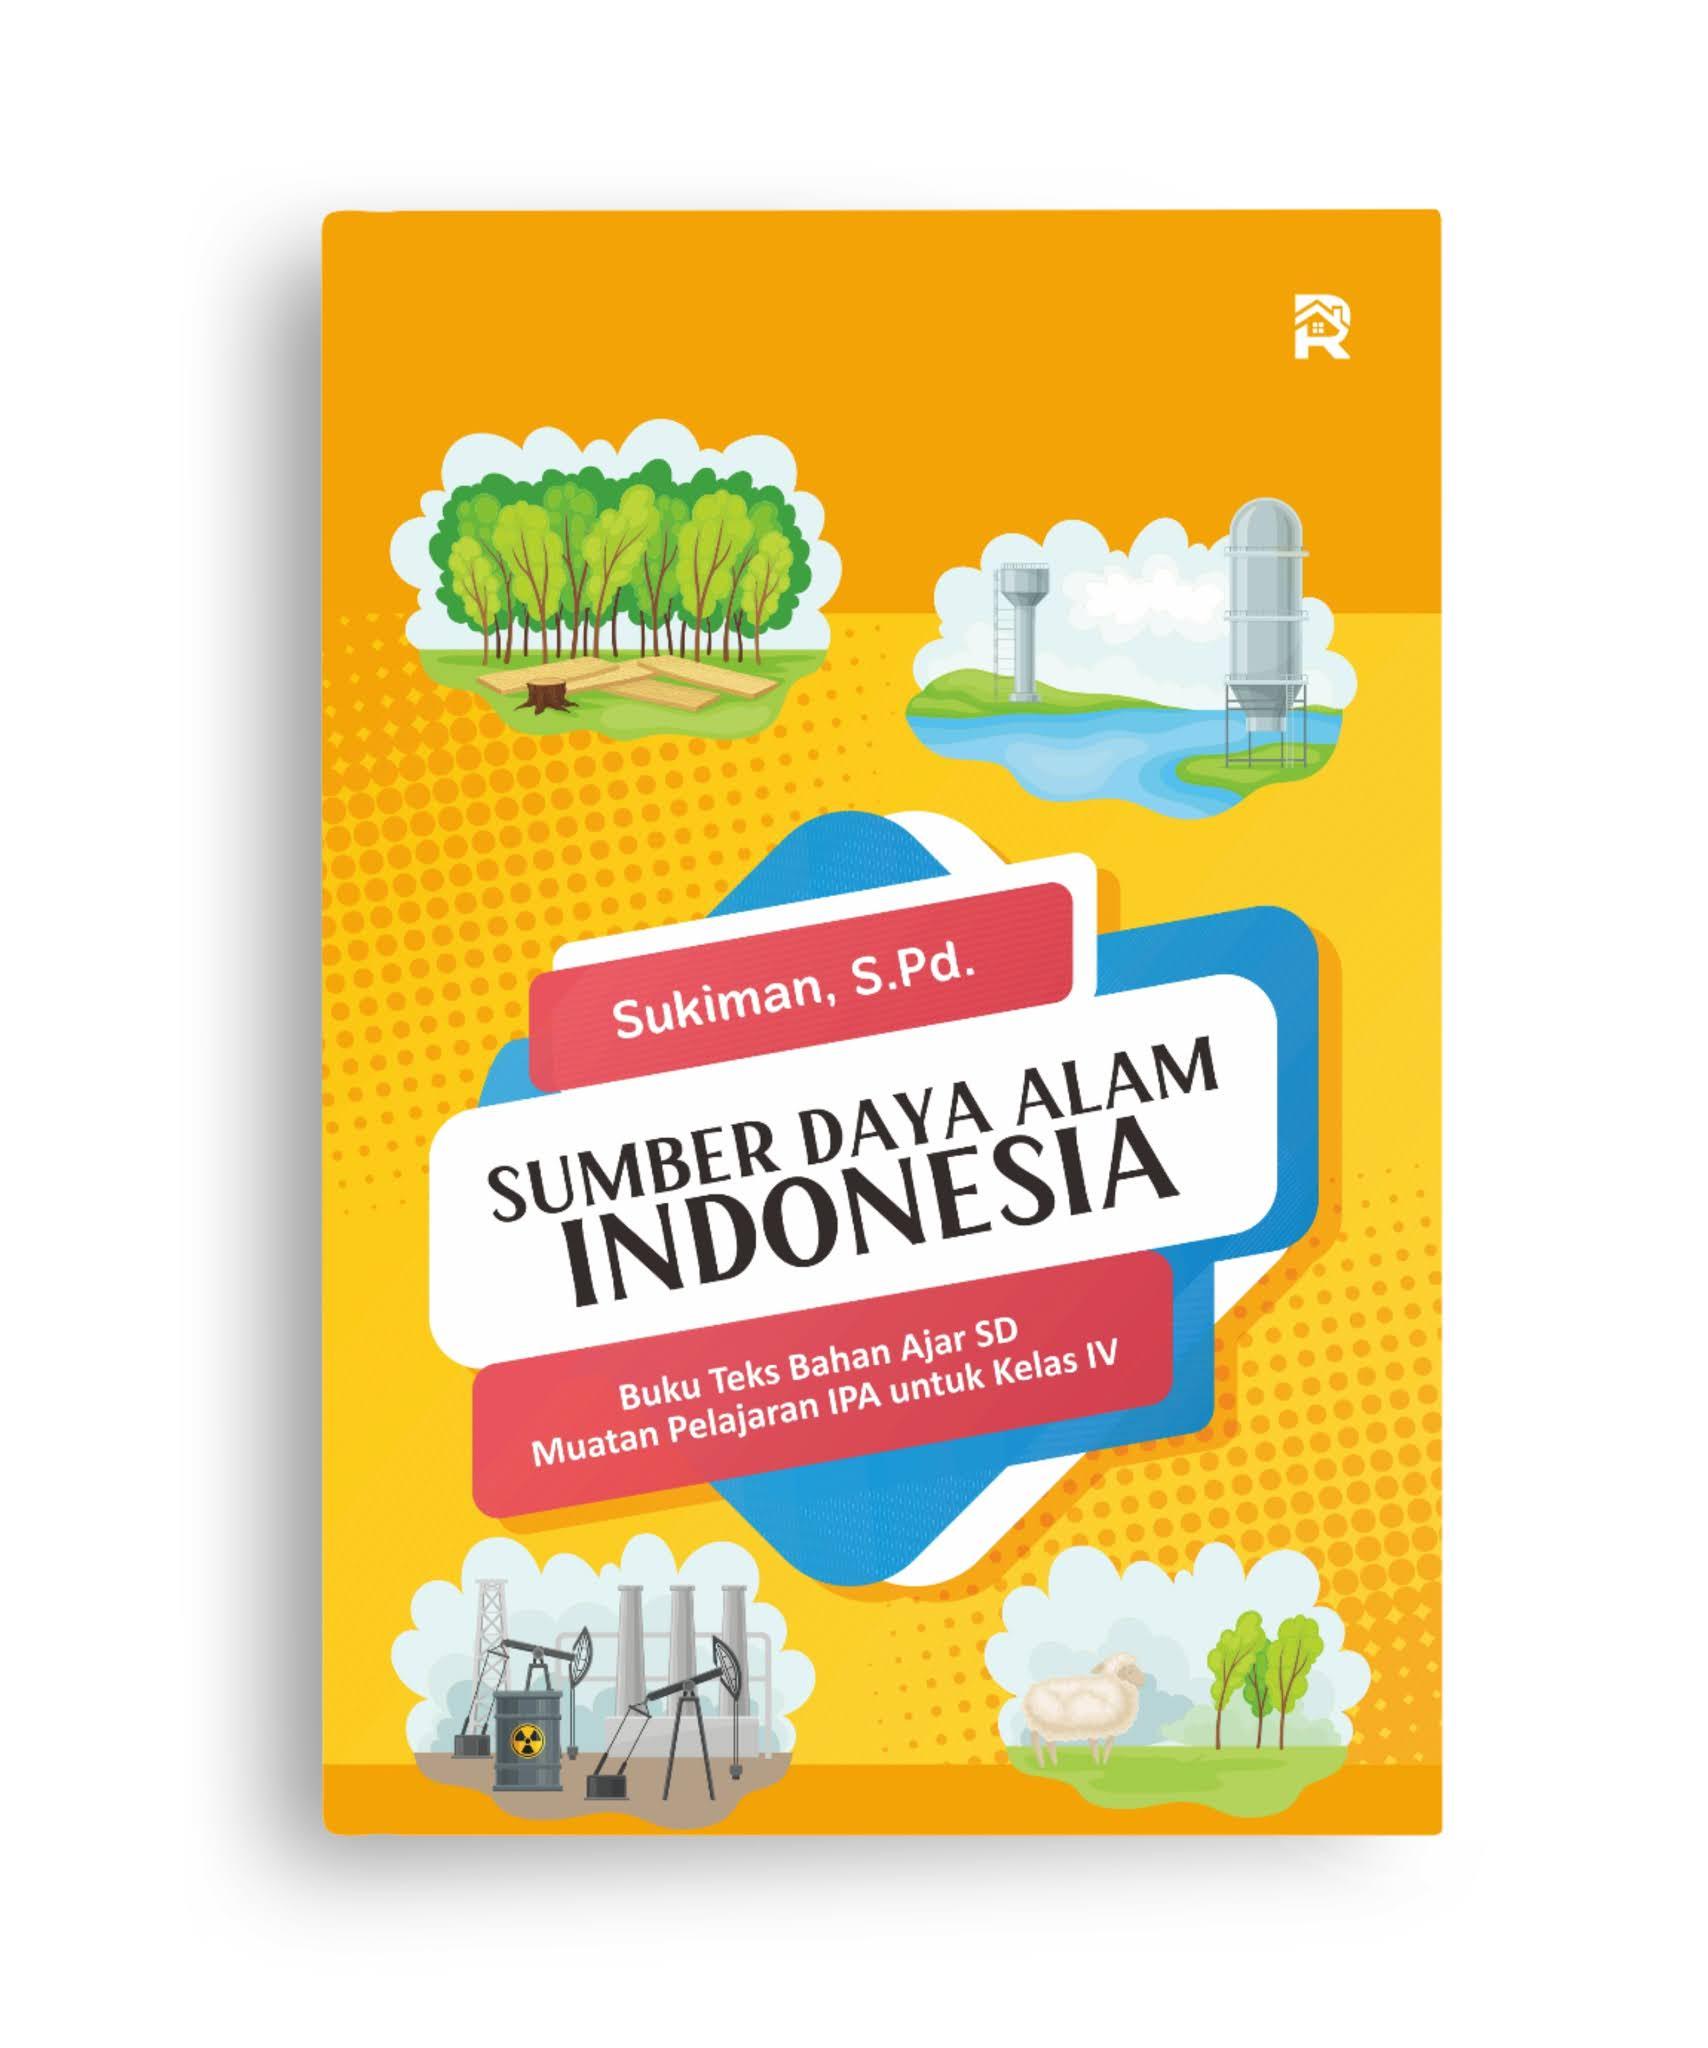 Sumber Daya Alam Indonesia (Buku Teks Bahan Ajar SD Muatan Pelajaran IPA untuk Kelas IV)